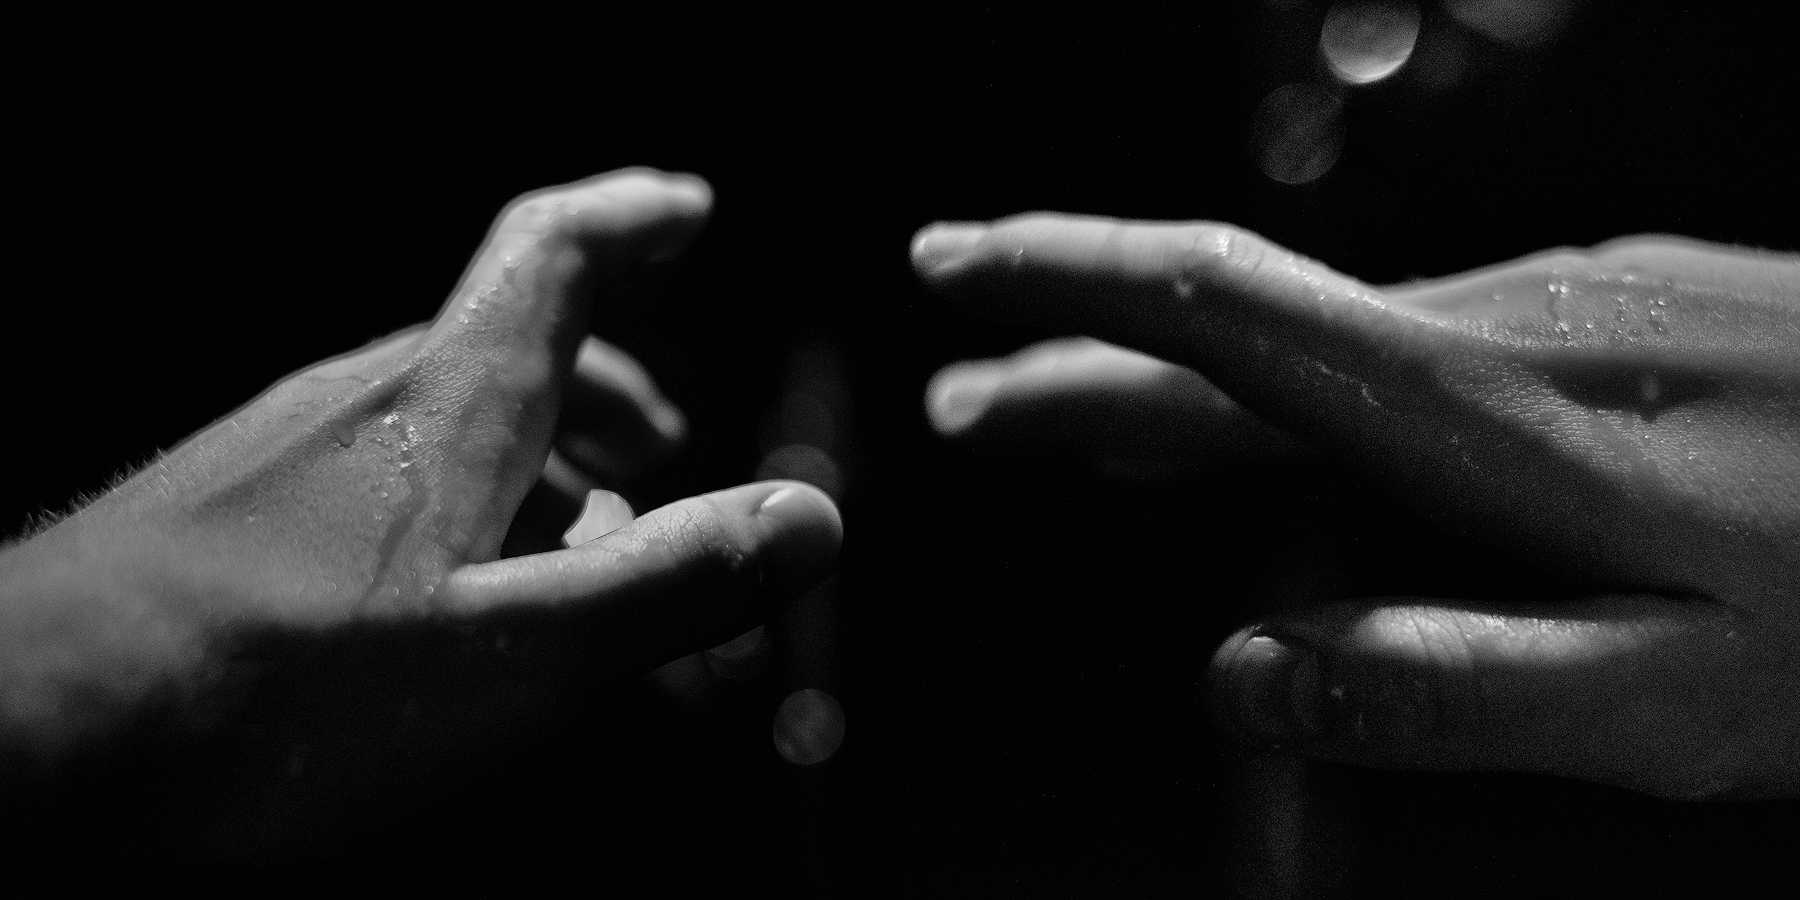 Hands by Anselmeth